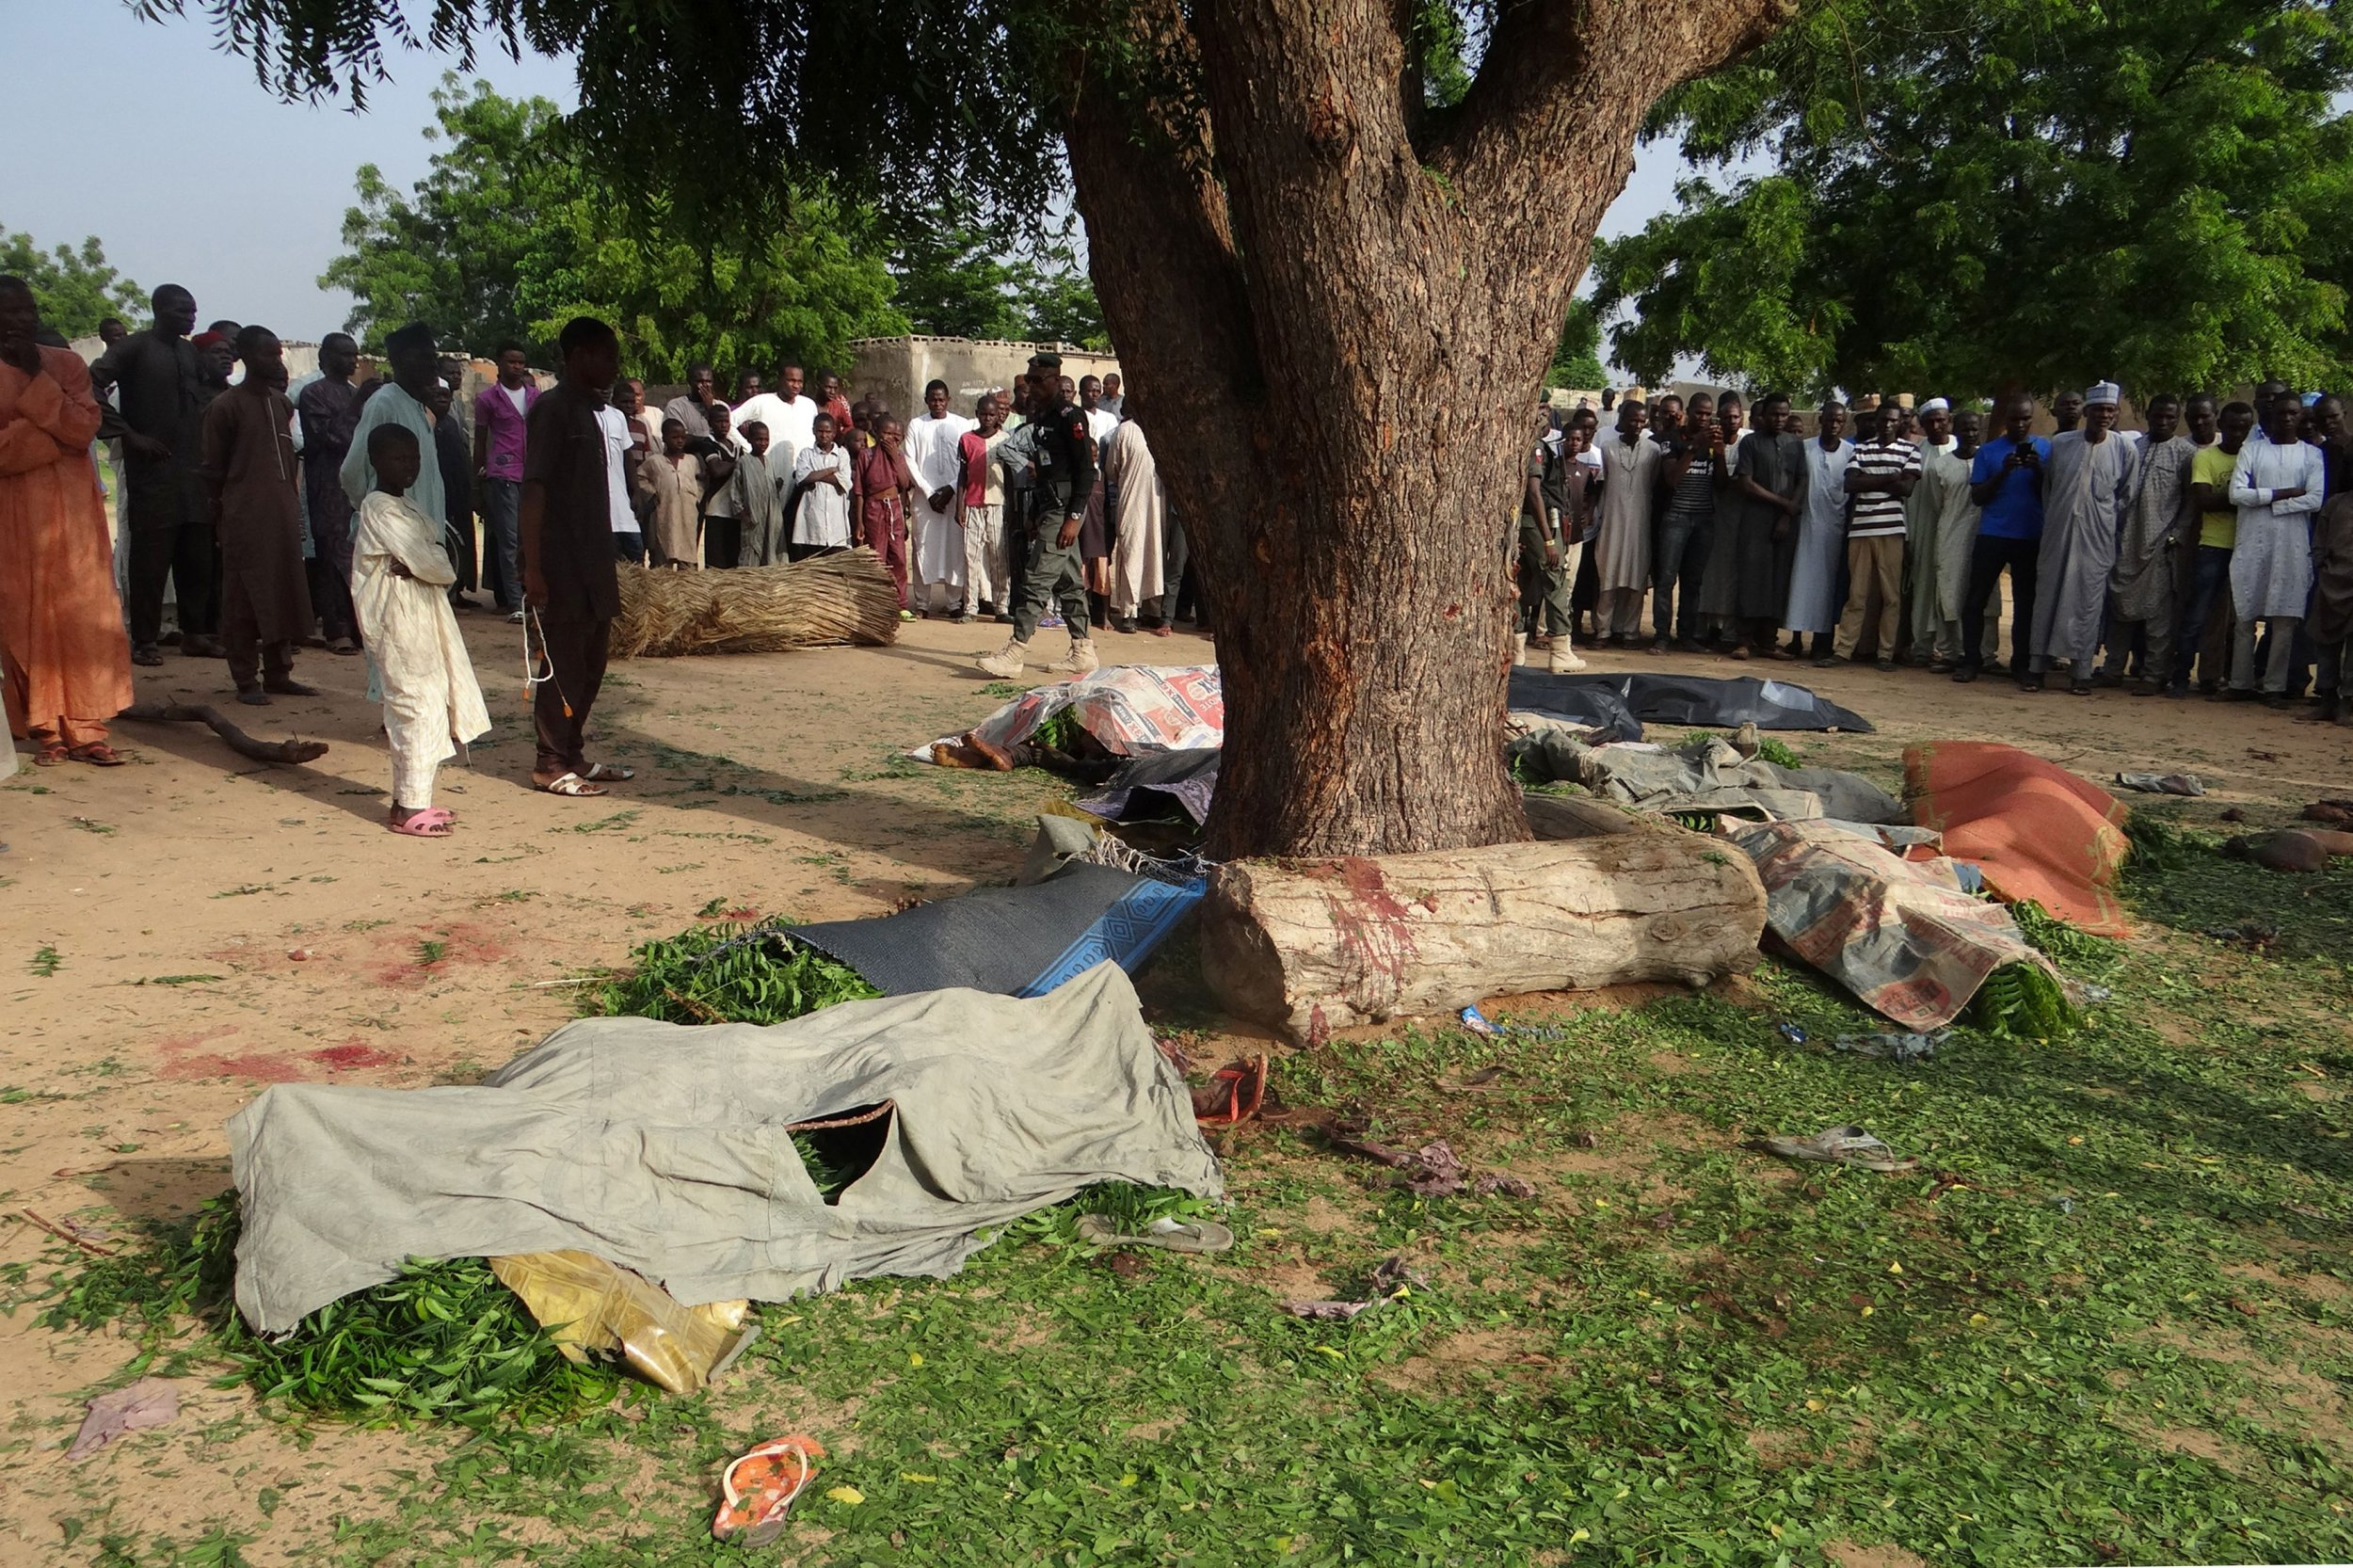 Maiduguri female suicide bombers